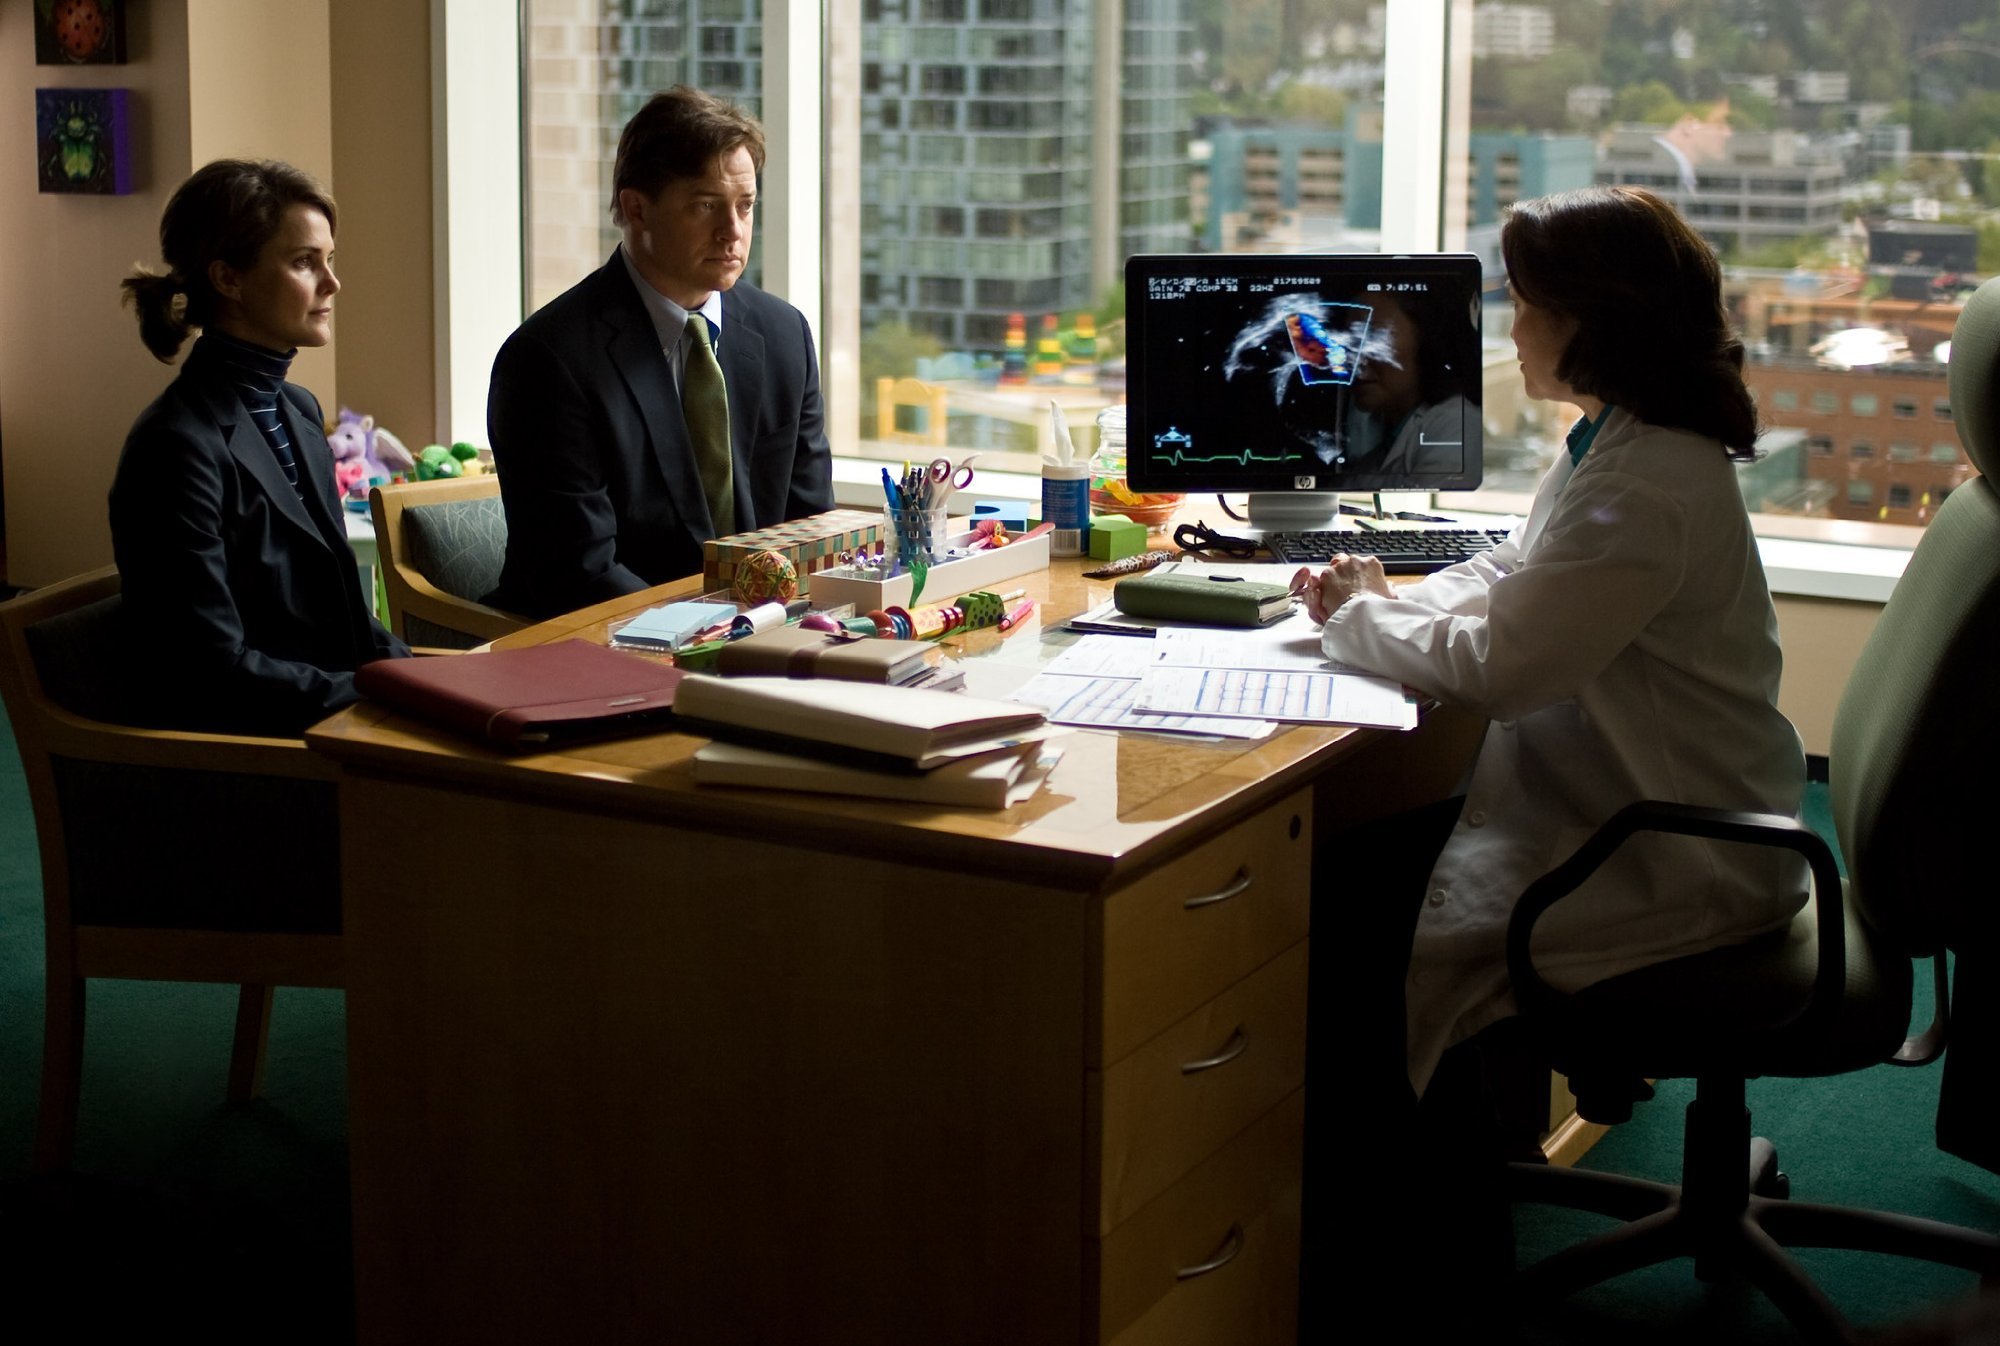 Download the full filmography actor Brendan Fraser